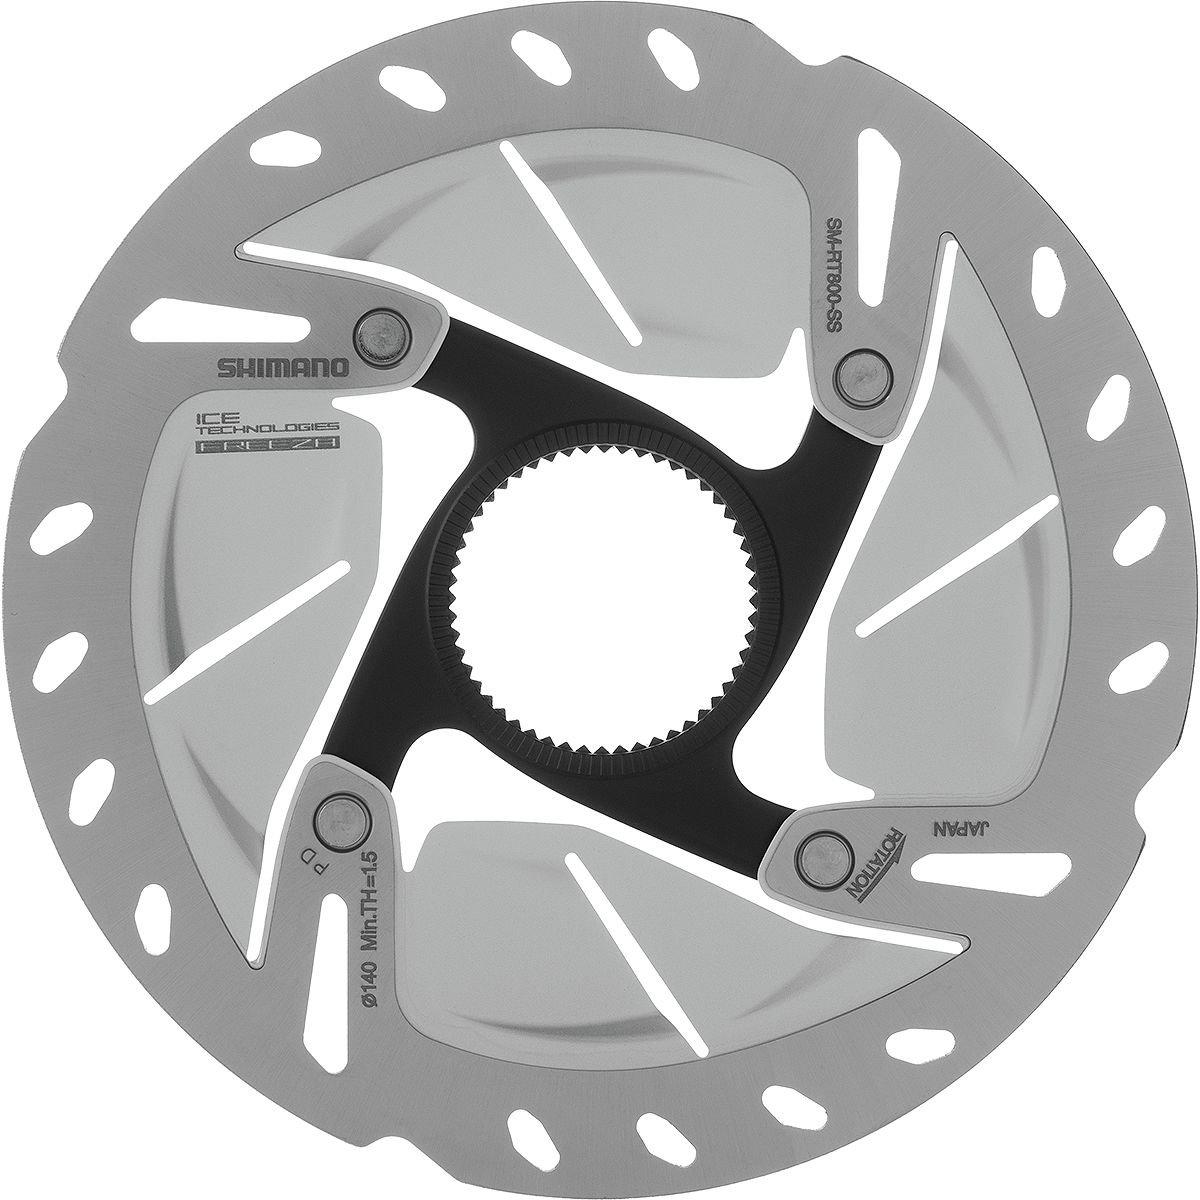 SHIMANO Ultegra R8000 Disc Rotor - 2017 160 by SHIMANO